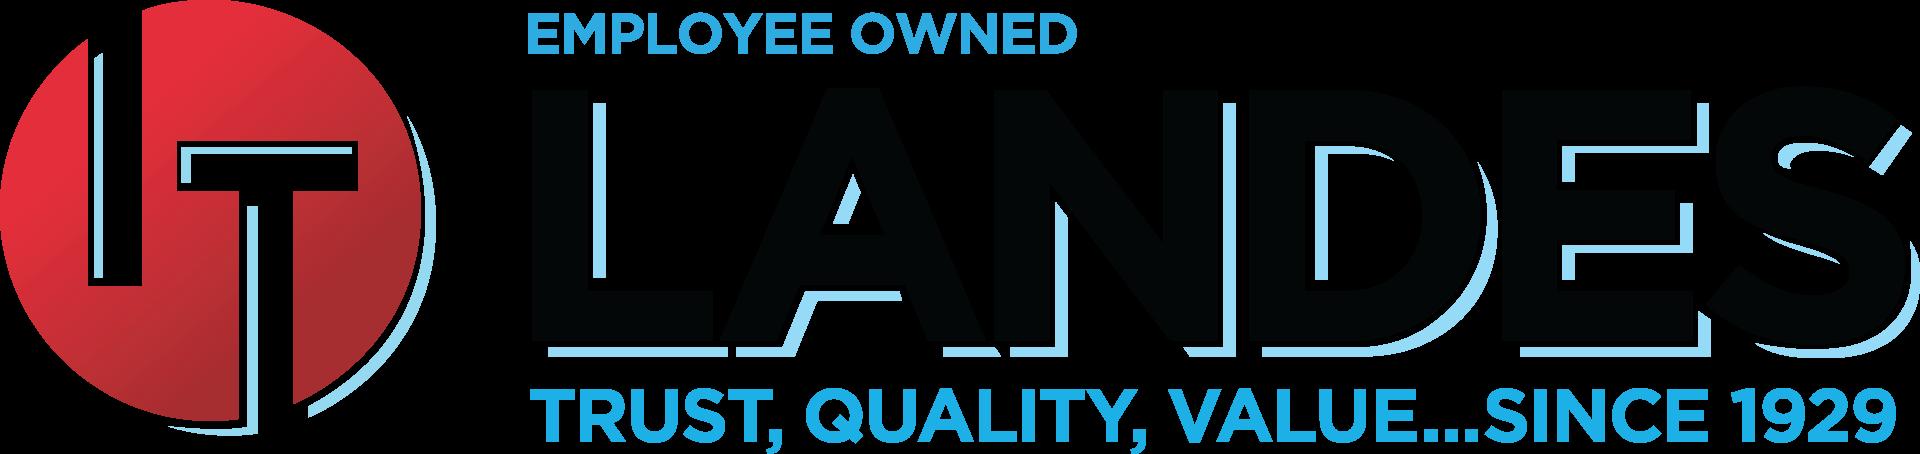 IT Landes logo